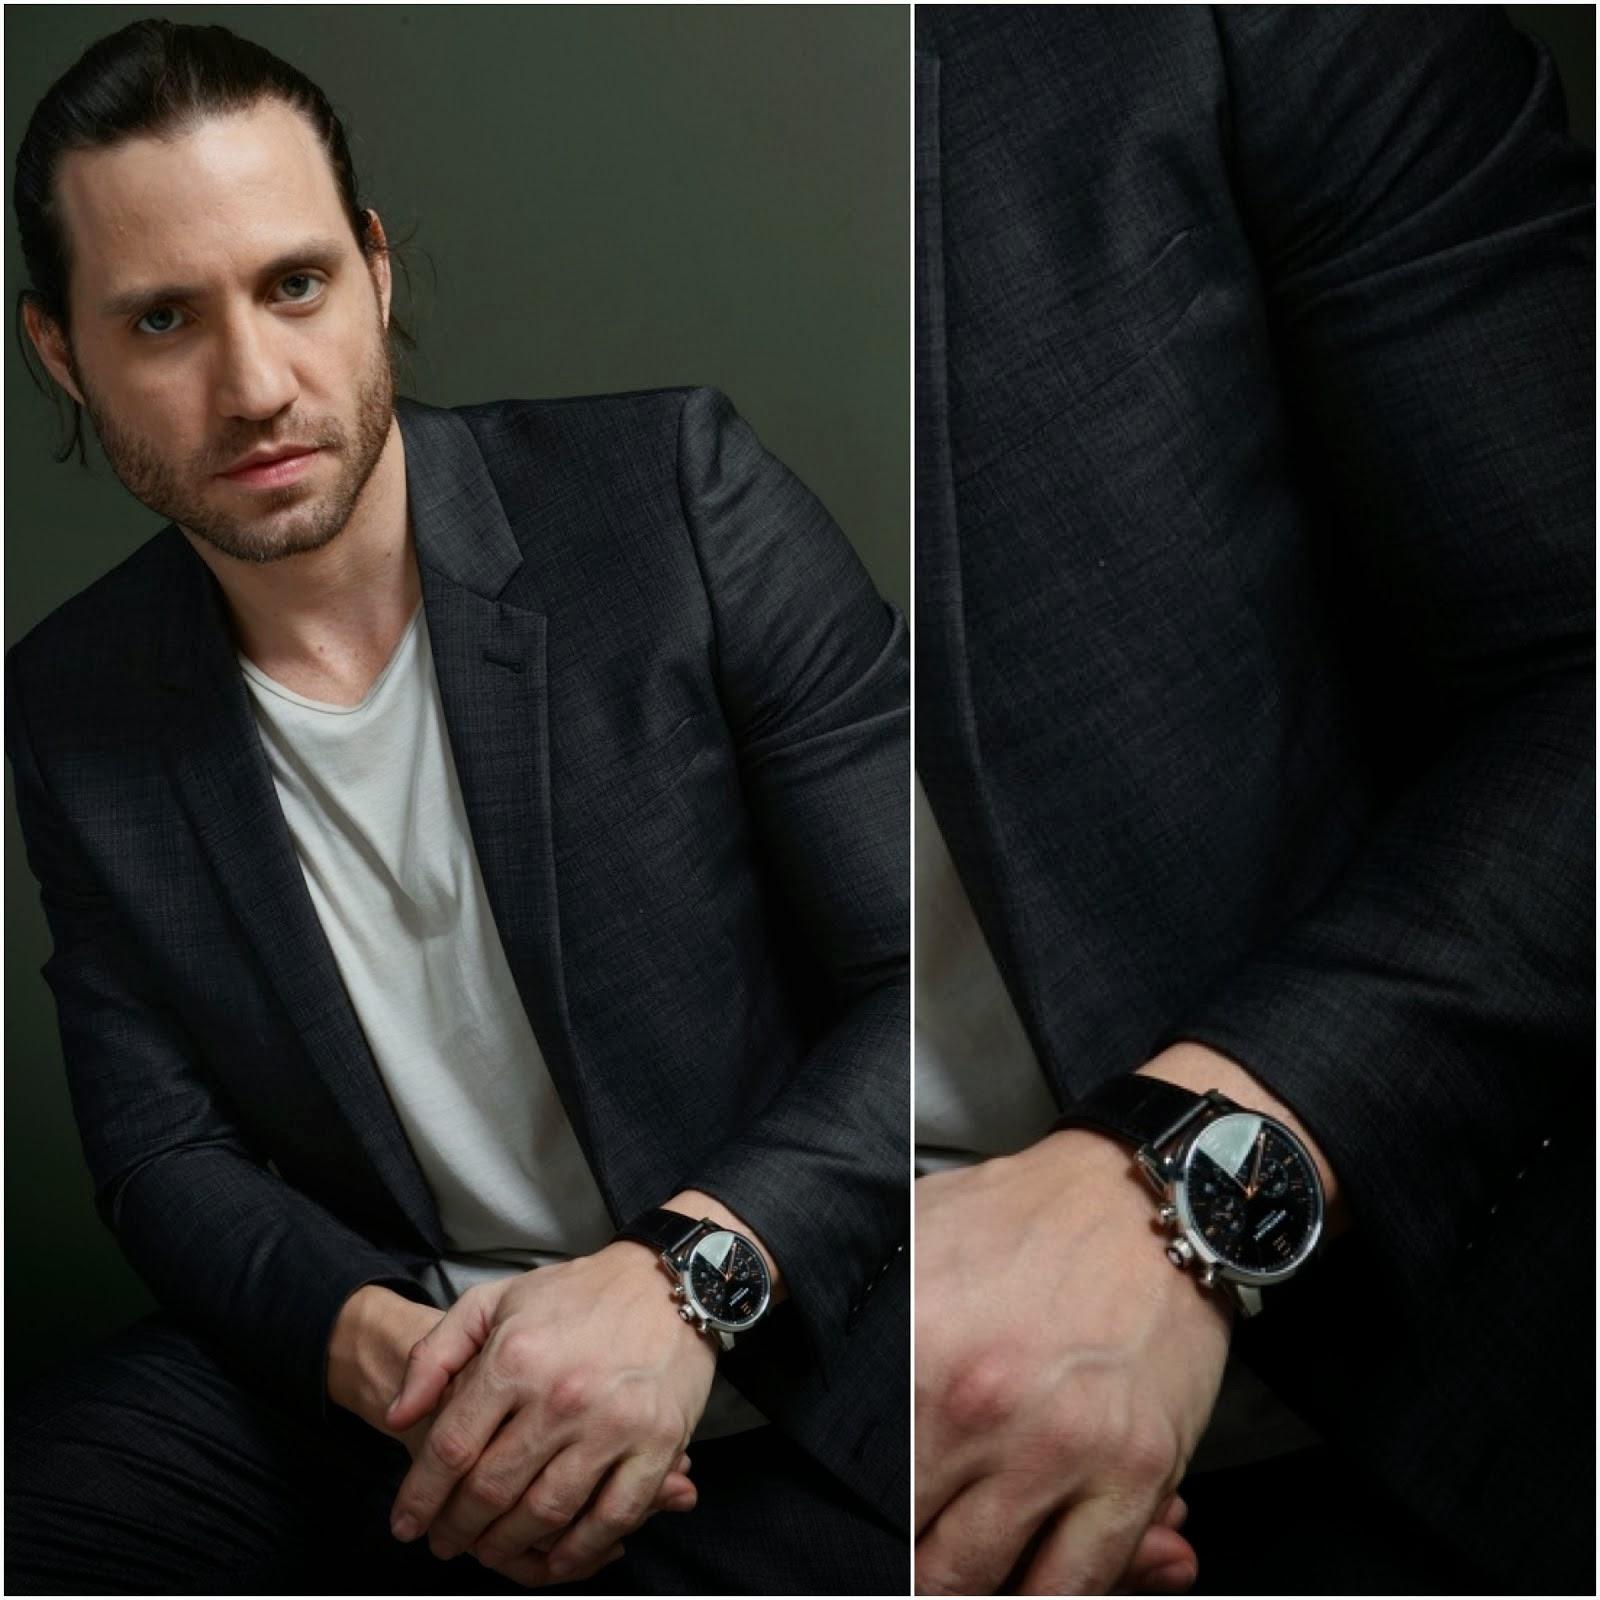 00O00 Menswear Blog: Édgar Ramírez's Montblanc TimeWalker Chronograph - 'Libertador' Portraits in Toronto